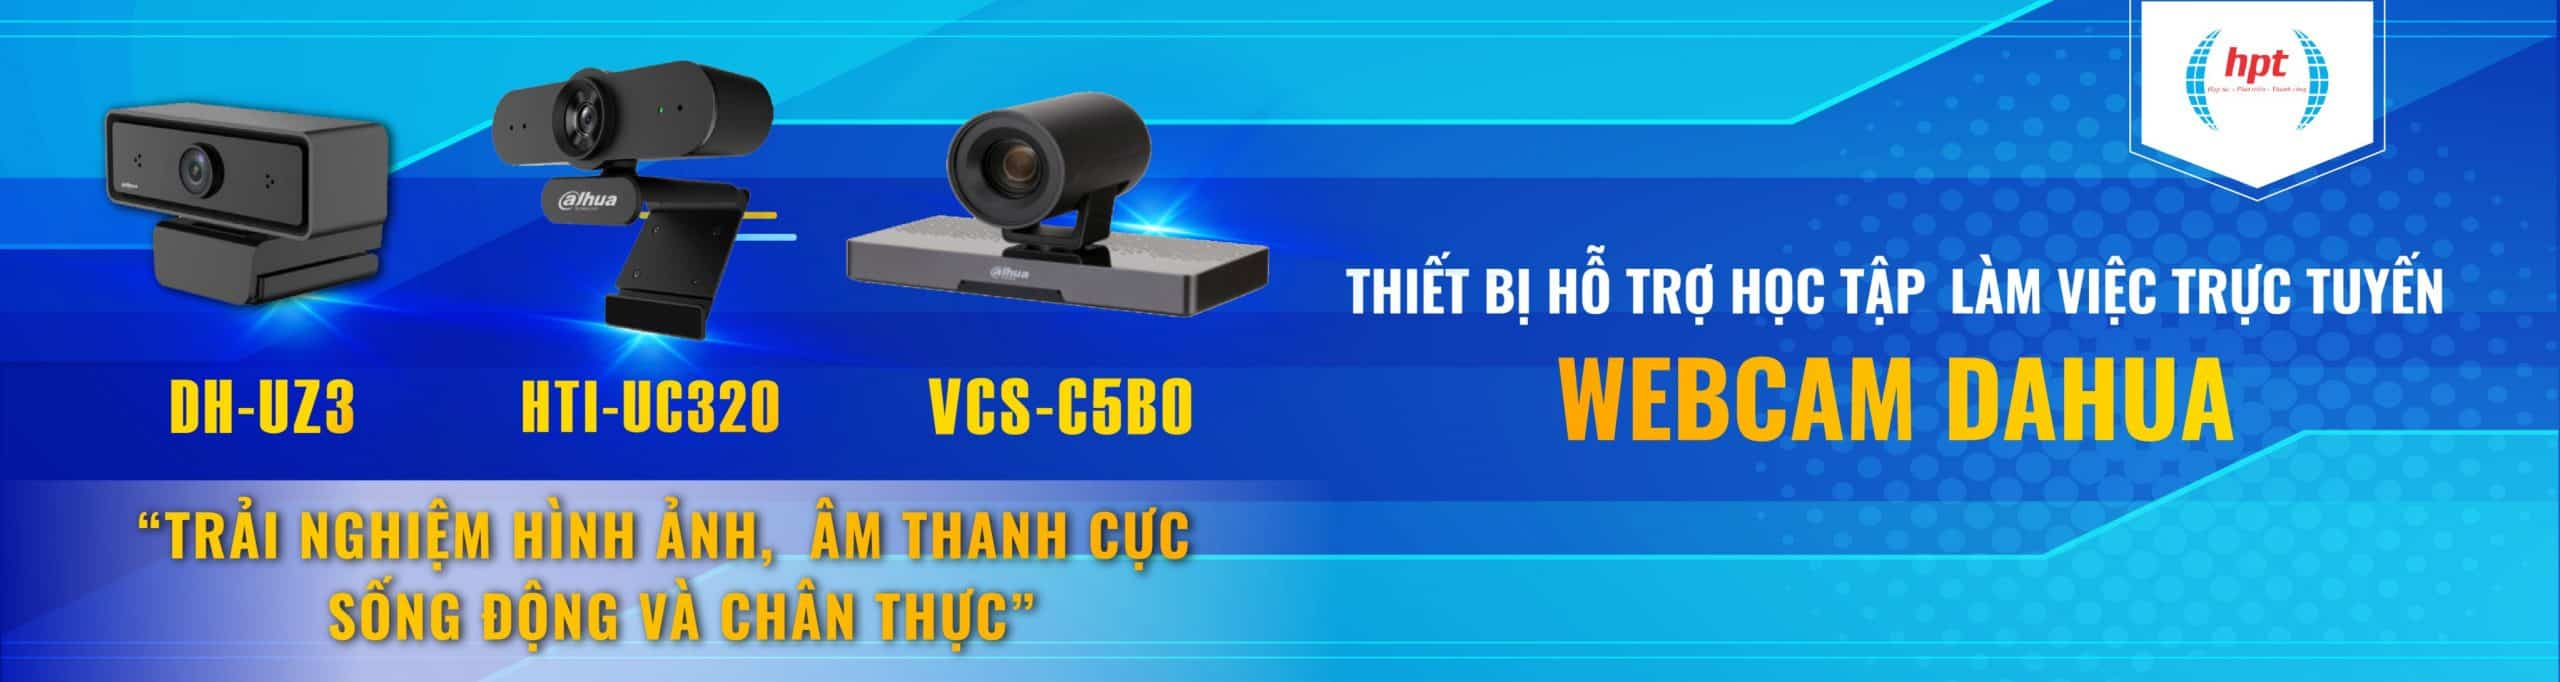 Banner webcam